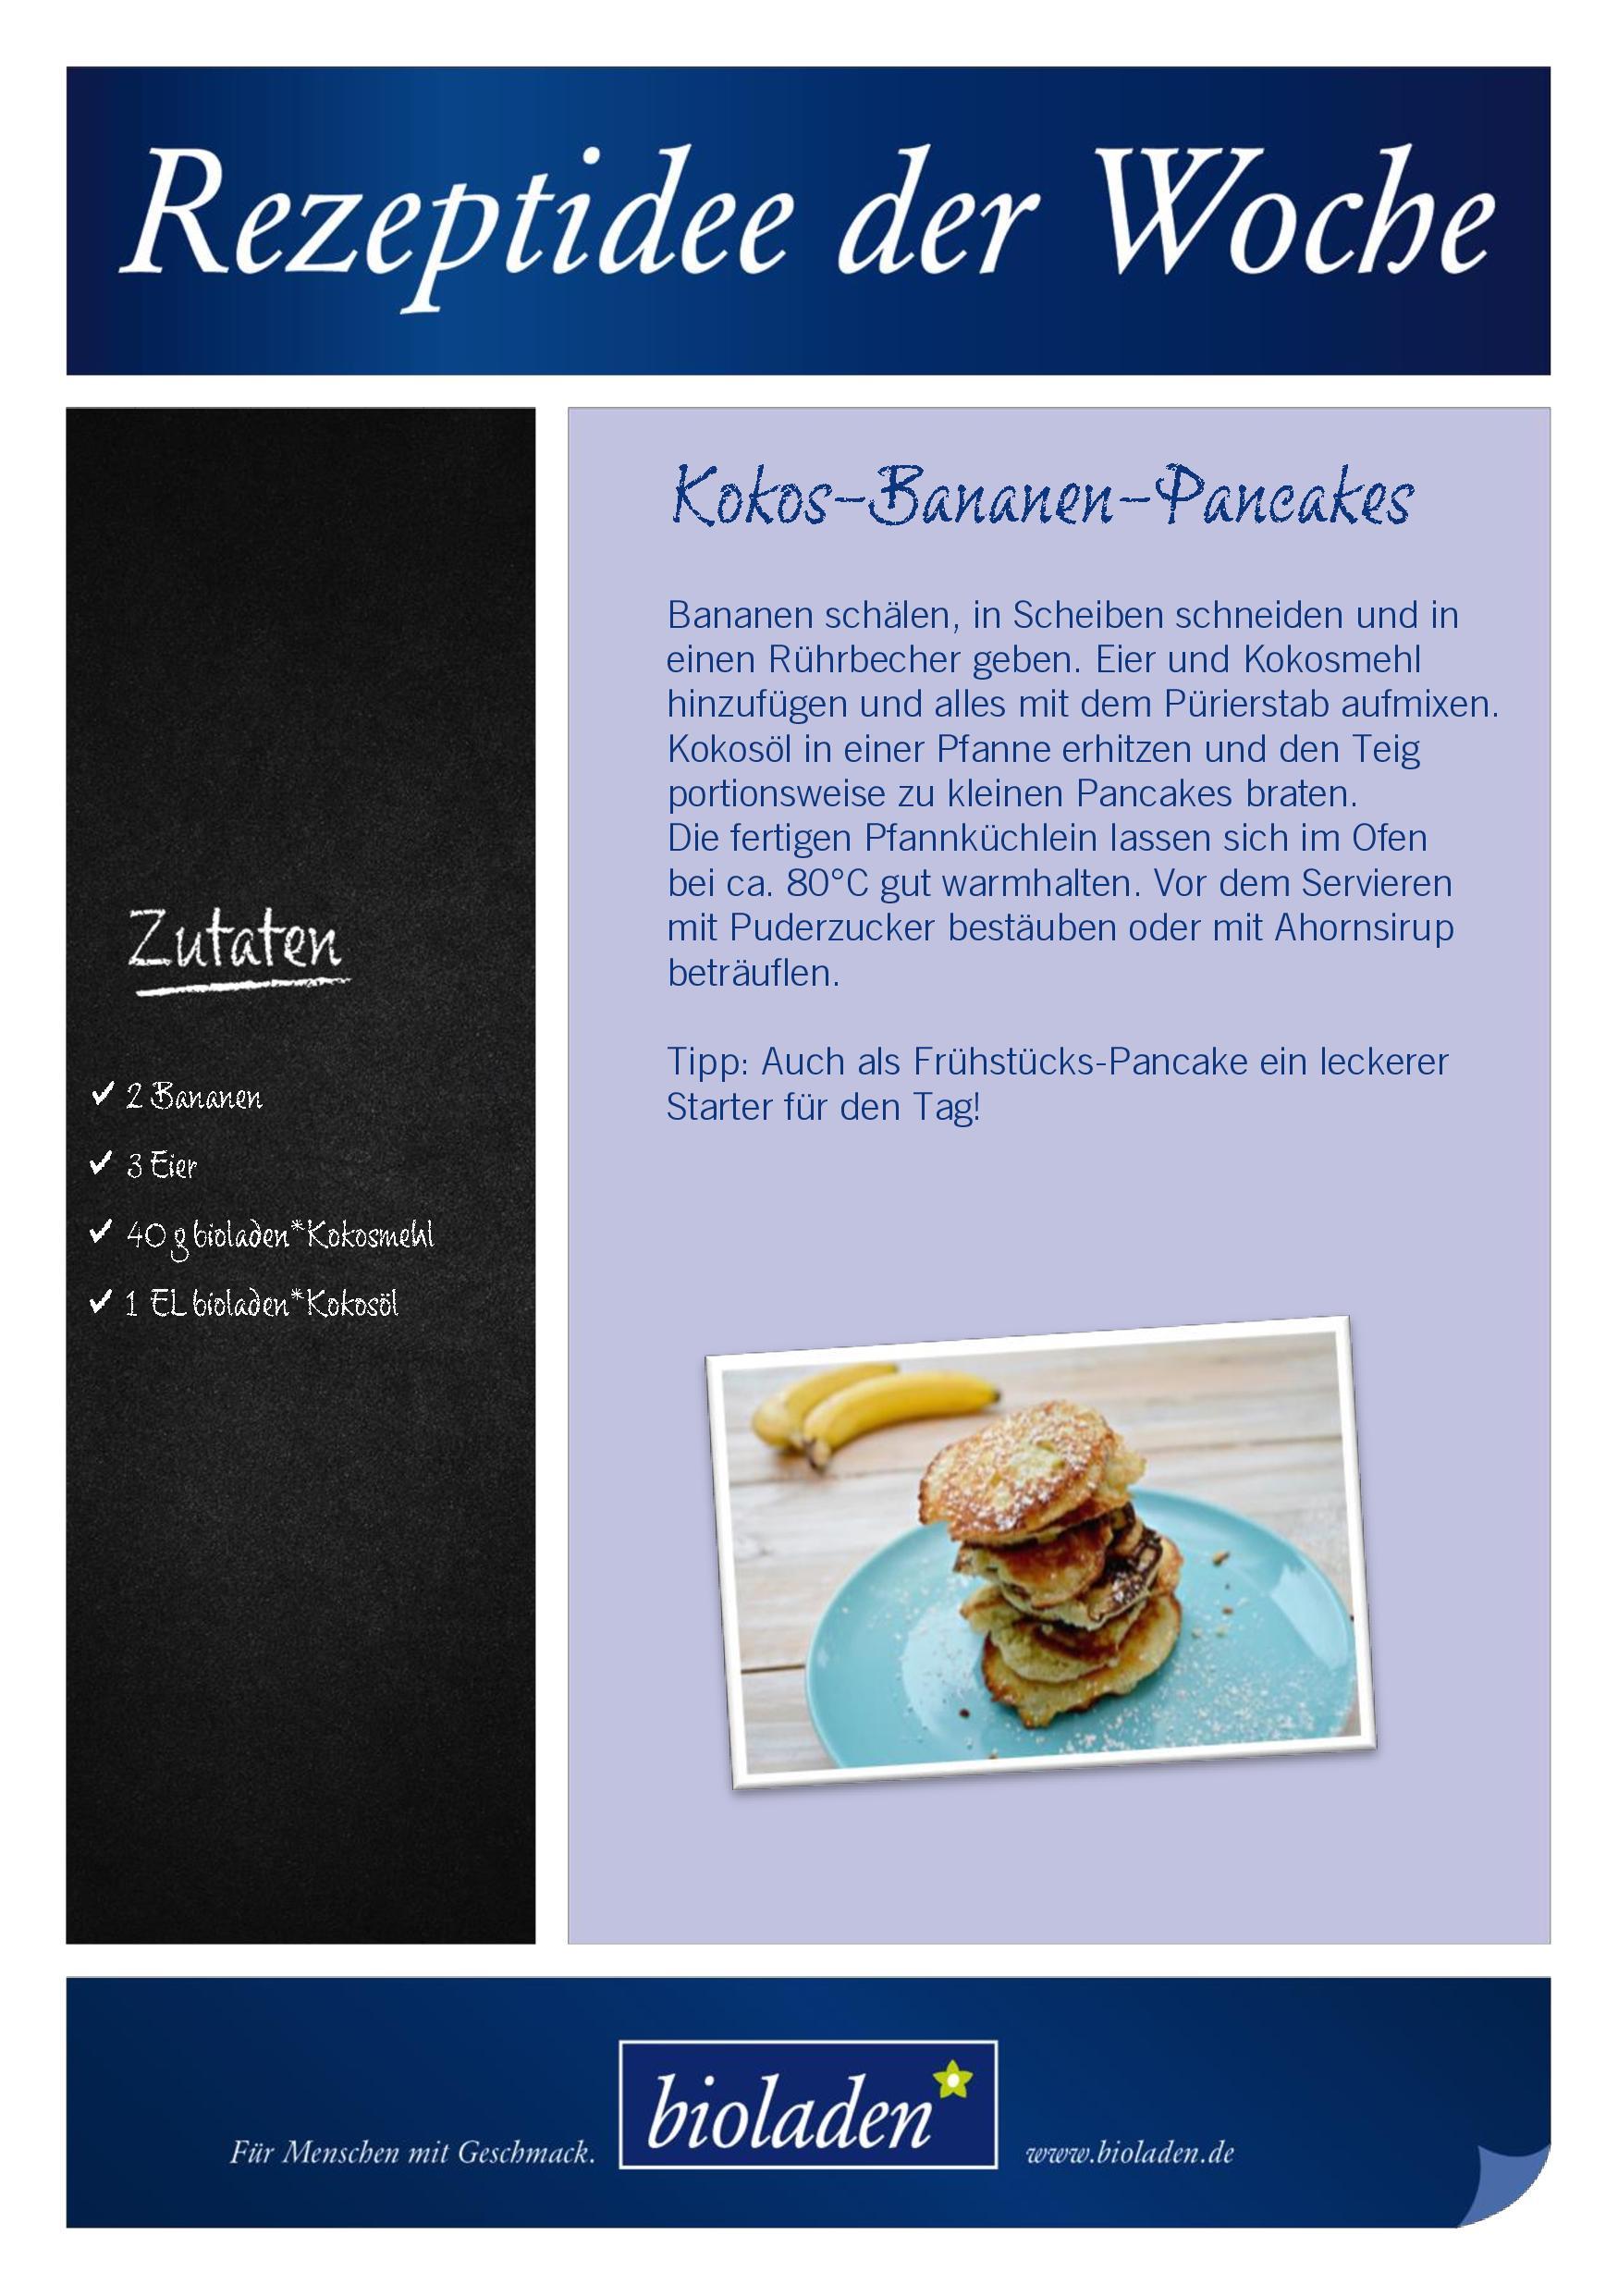 Haben das Zeug zum Lieblings-Biofrühstück: Leckere Kokos-Bananen-Pancakes